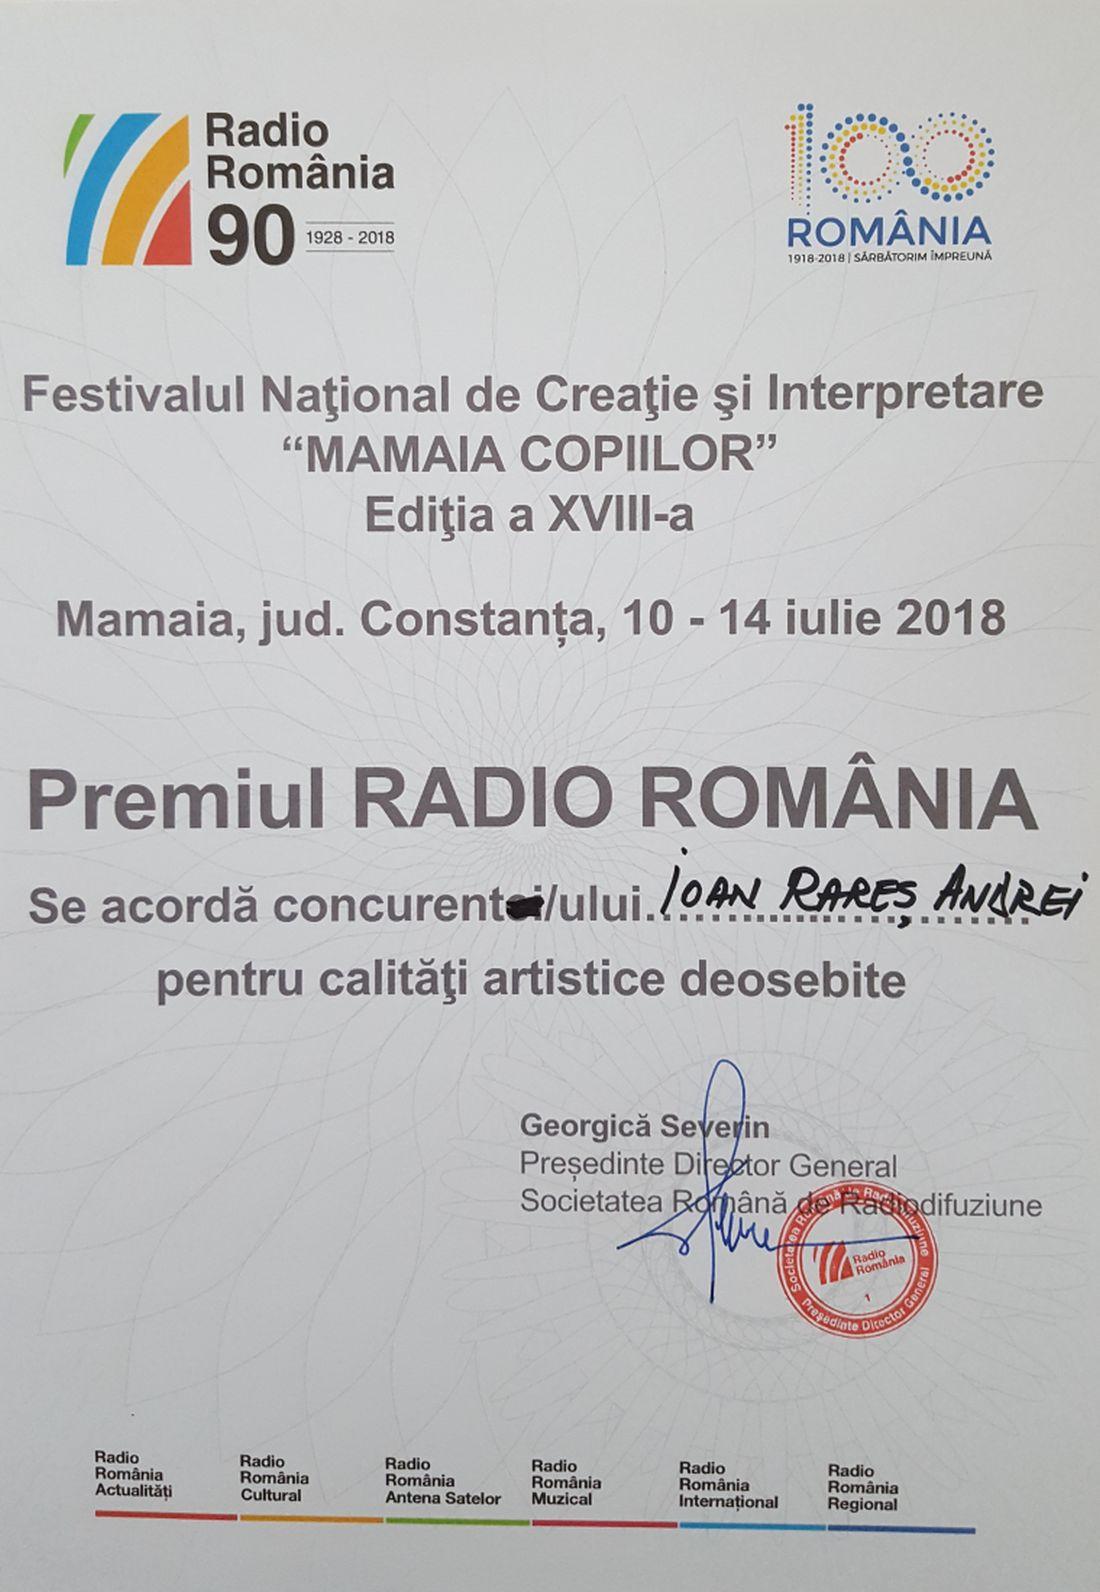 20180714_154857.Premiul Radio Romania.Interpretare Mamaia Copiilor 2018.Ioan Rares Andrei (foto by Bogdan Dragomir)